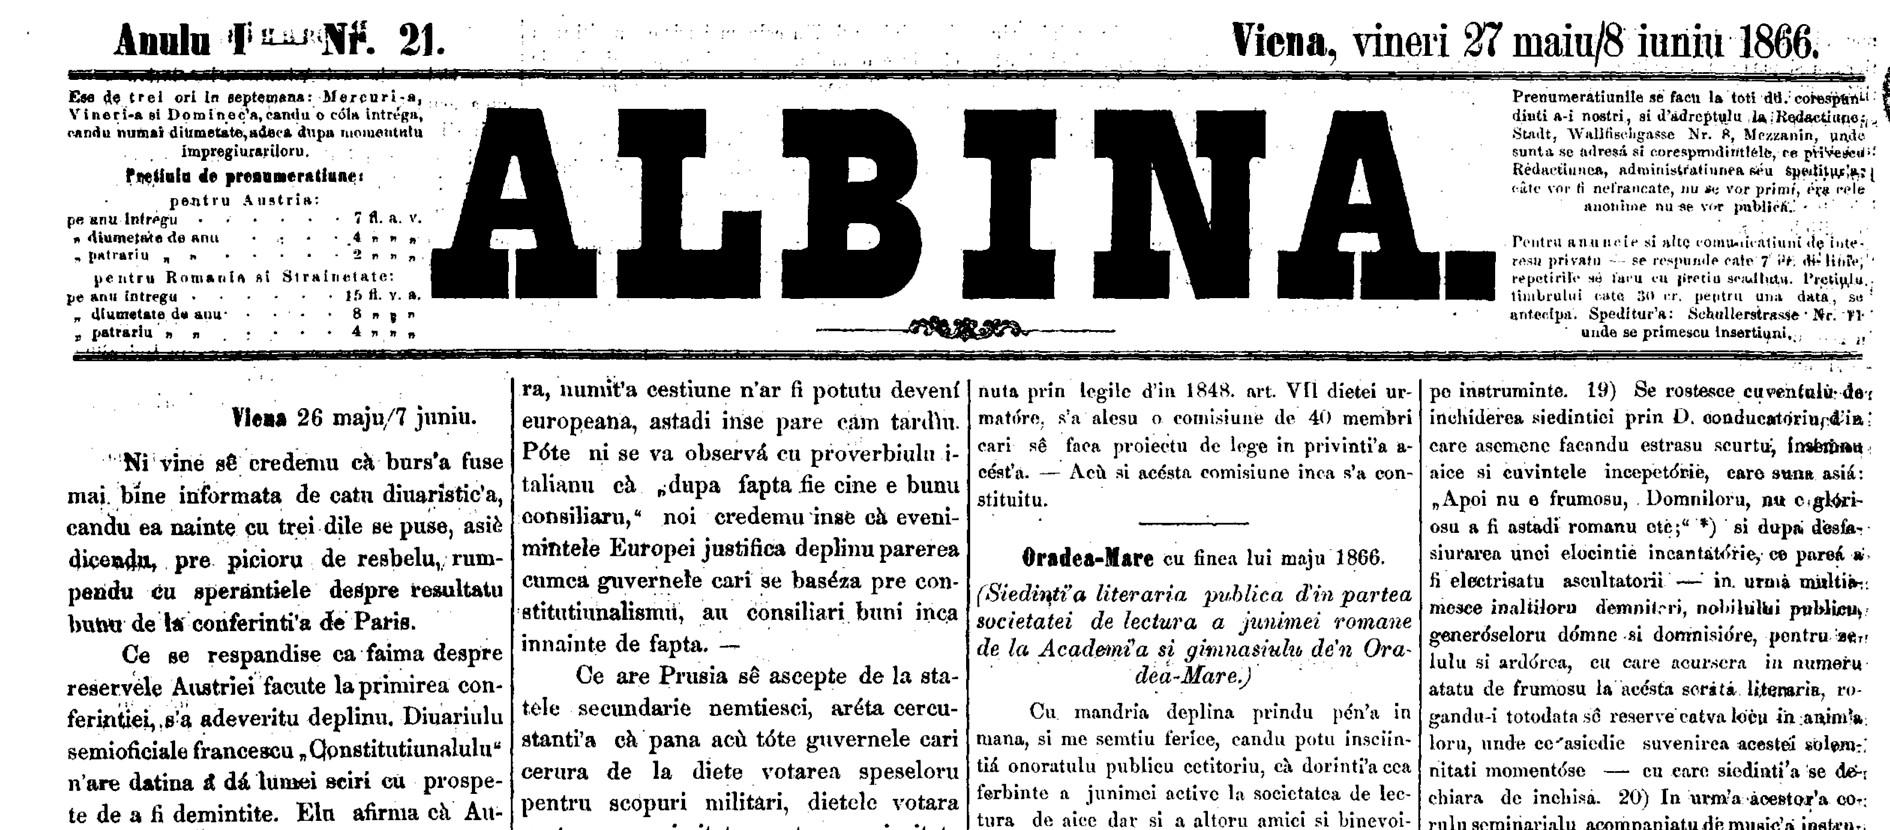 1866 mai 27-1